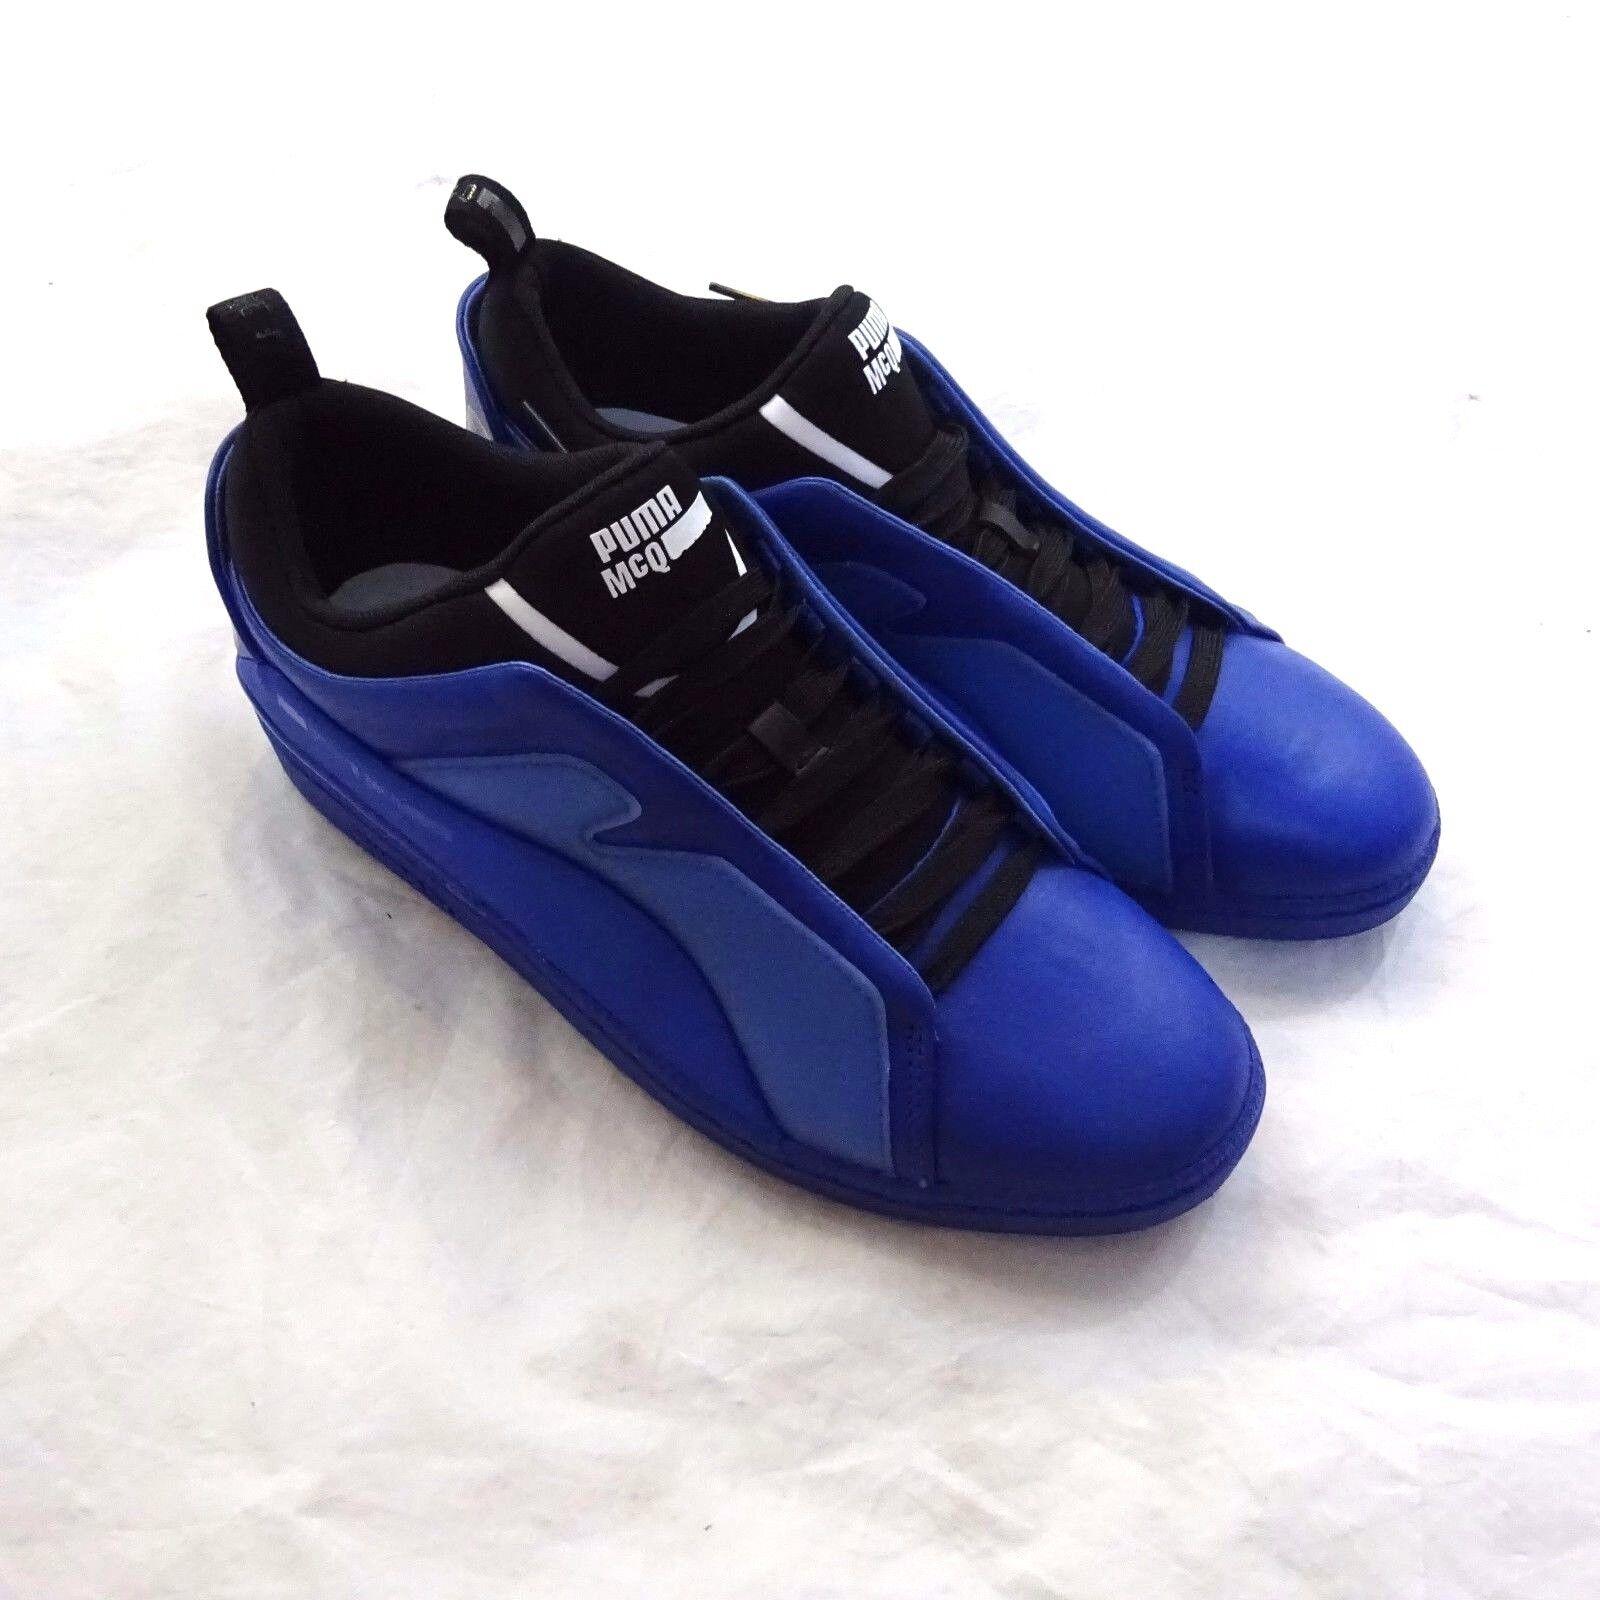 NEW Blau PUMA X ALEXANDER MCQUEEN BRACE LO ROYAL Blau NEW SNEAKER Schuhe 9.5 US 5464f4